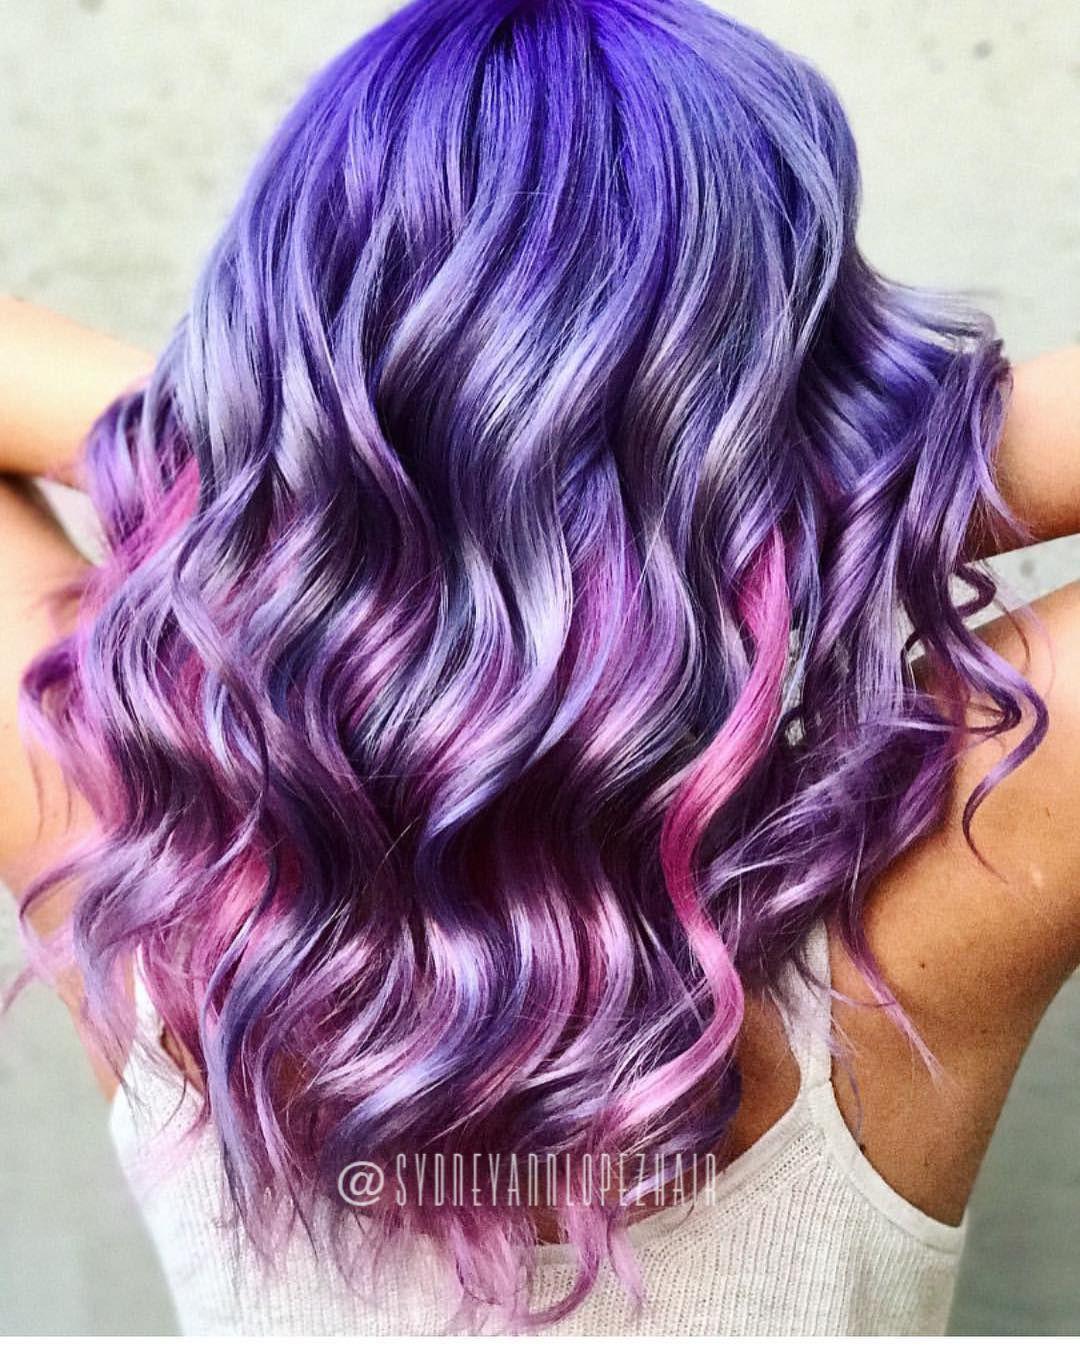 Metallic Cotton Candy Hair Peek A Boo Pink Underneath Modernsalon